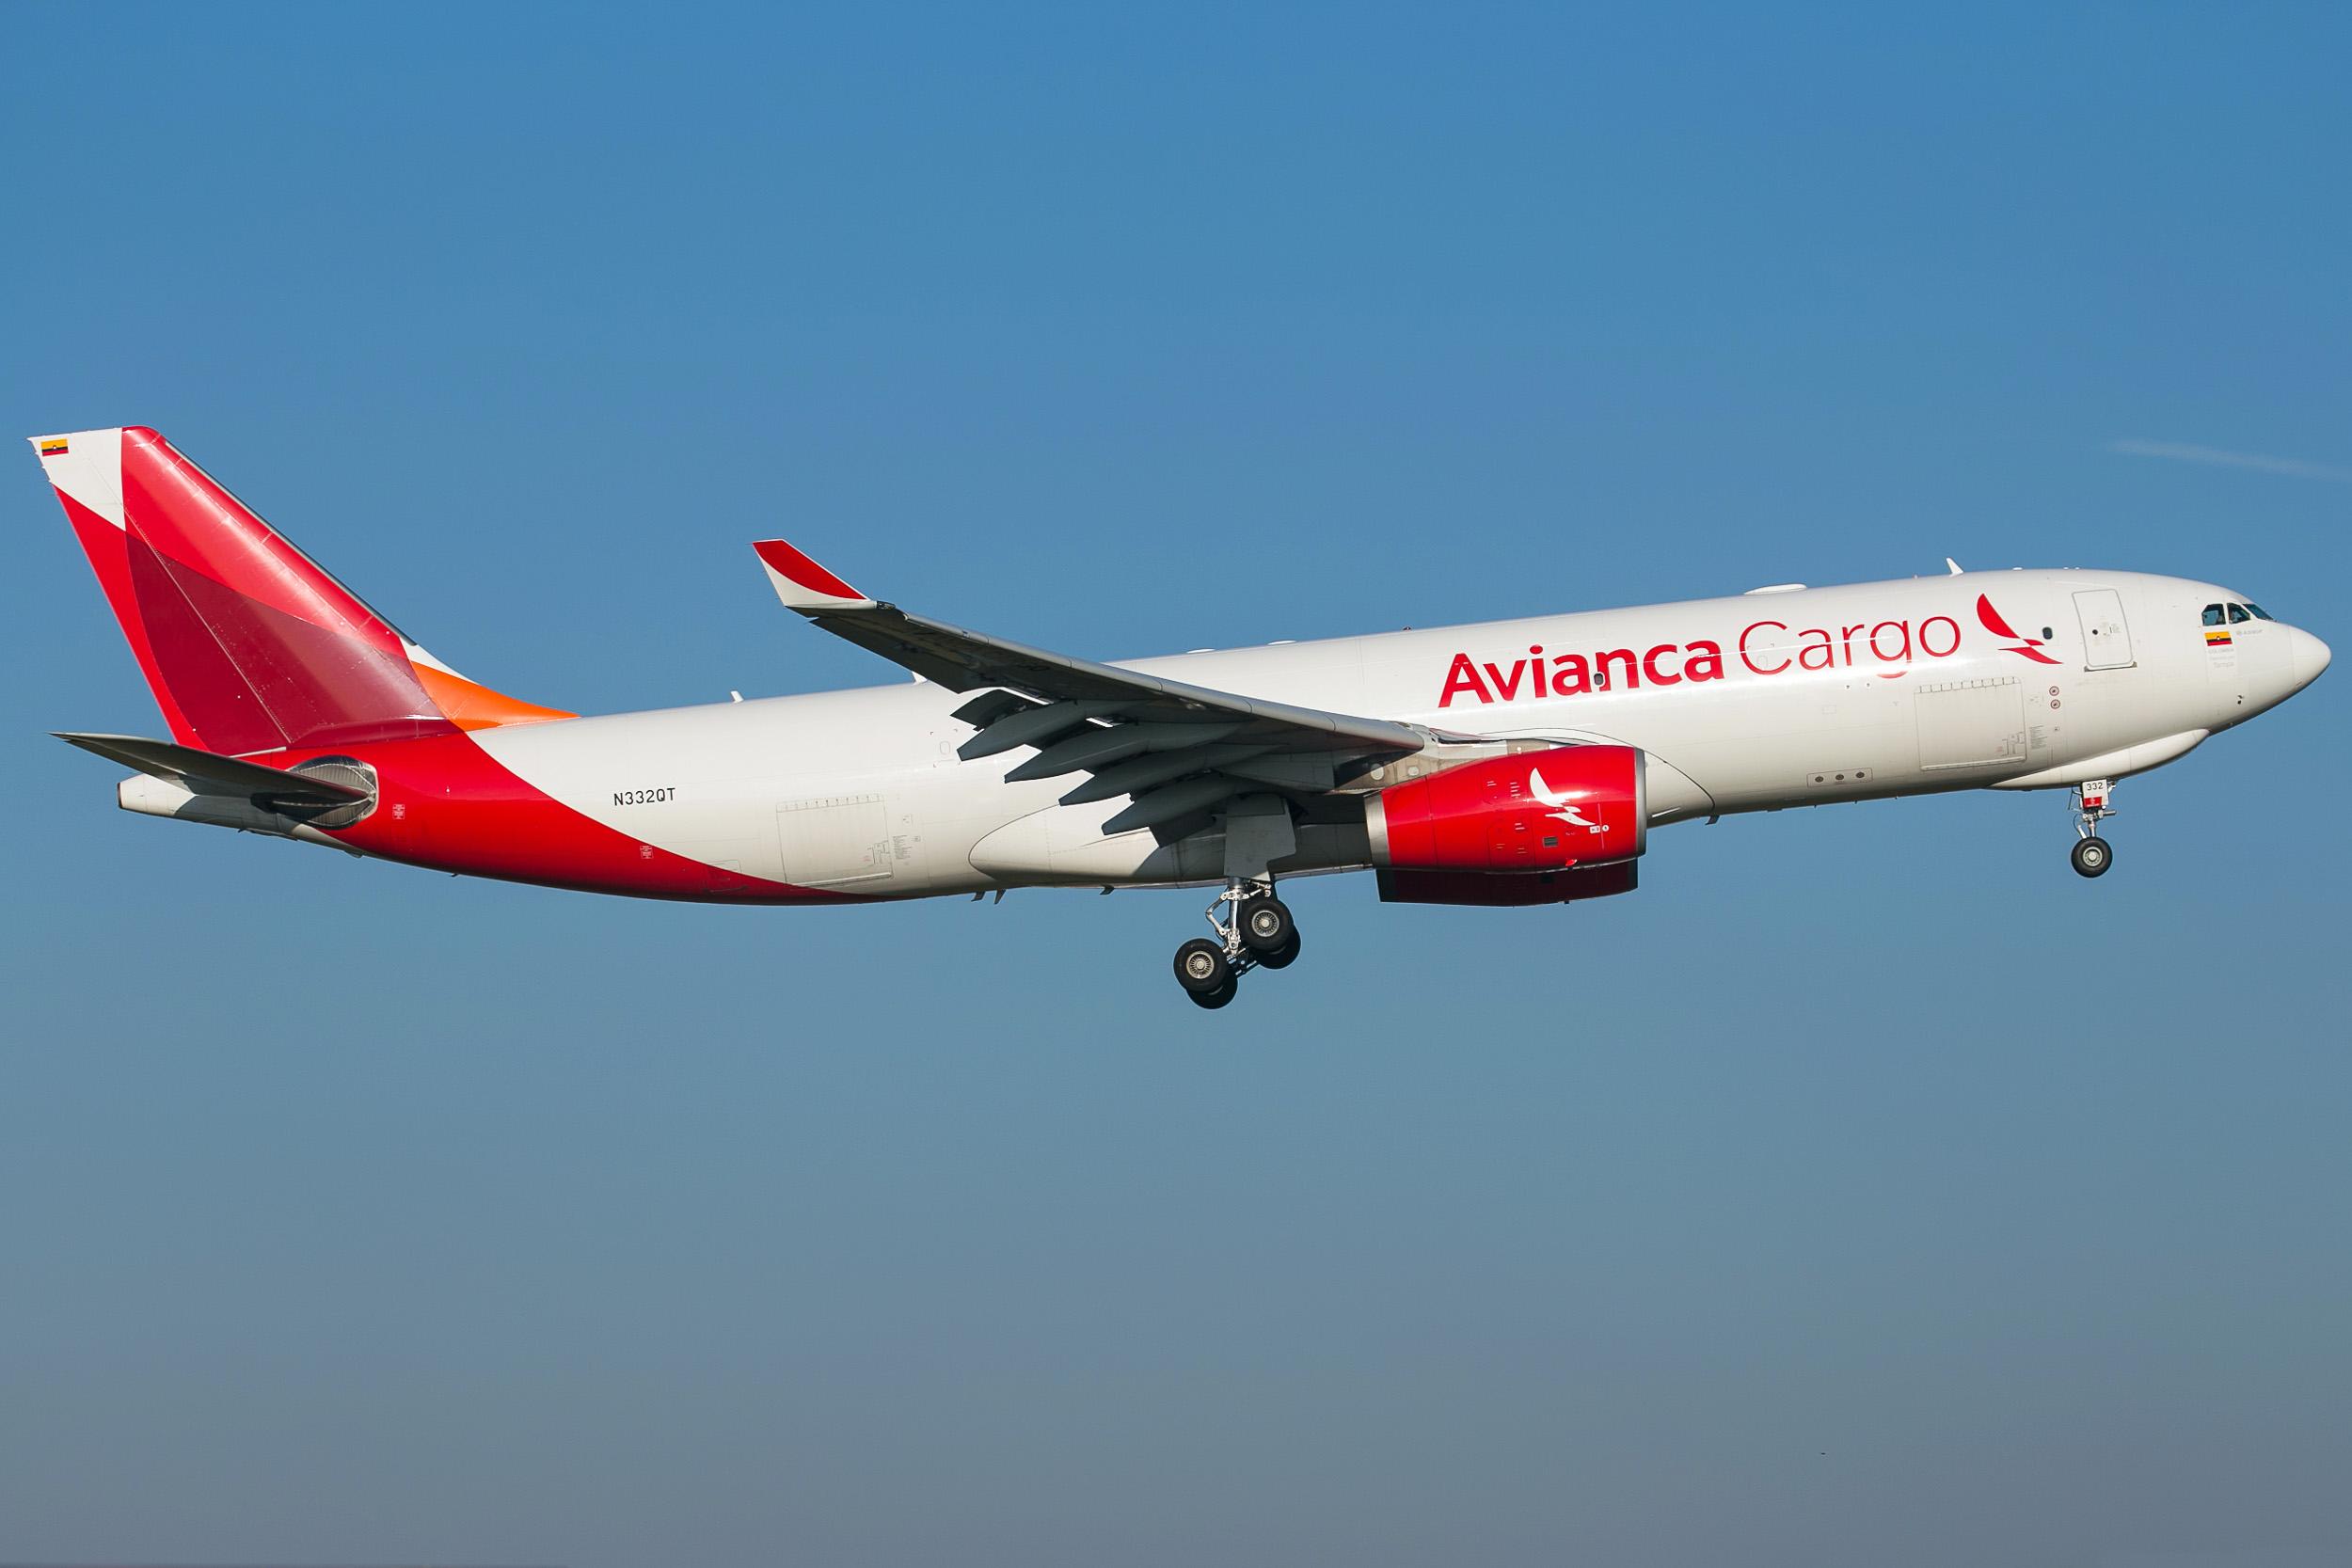 Avianca Cargo A330-243(F) N332QT